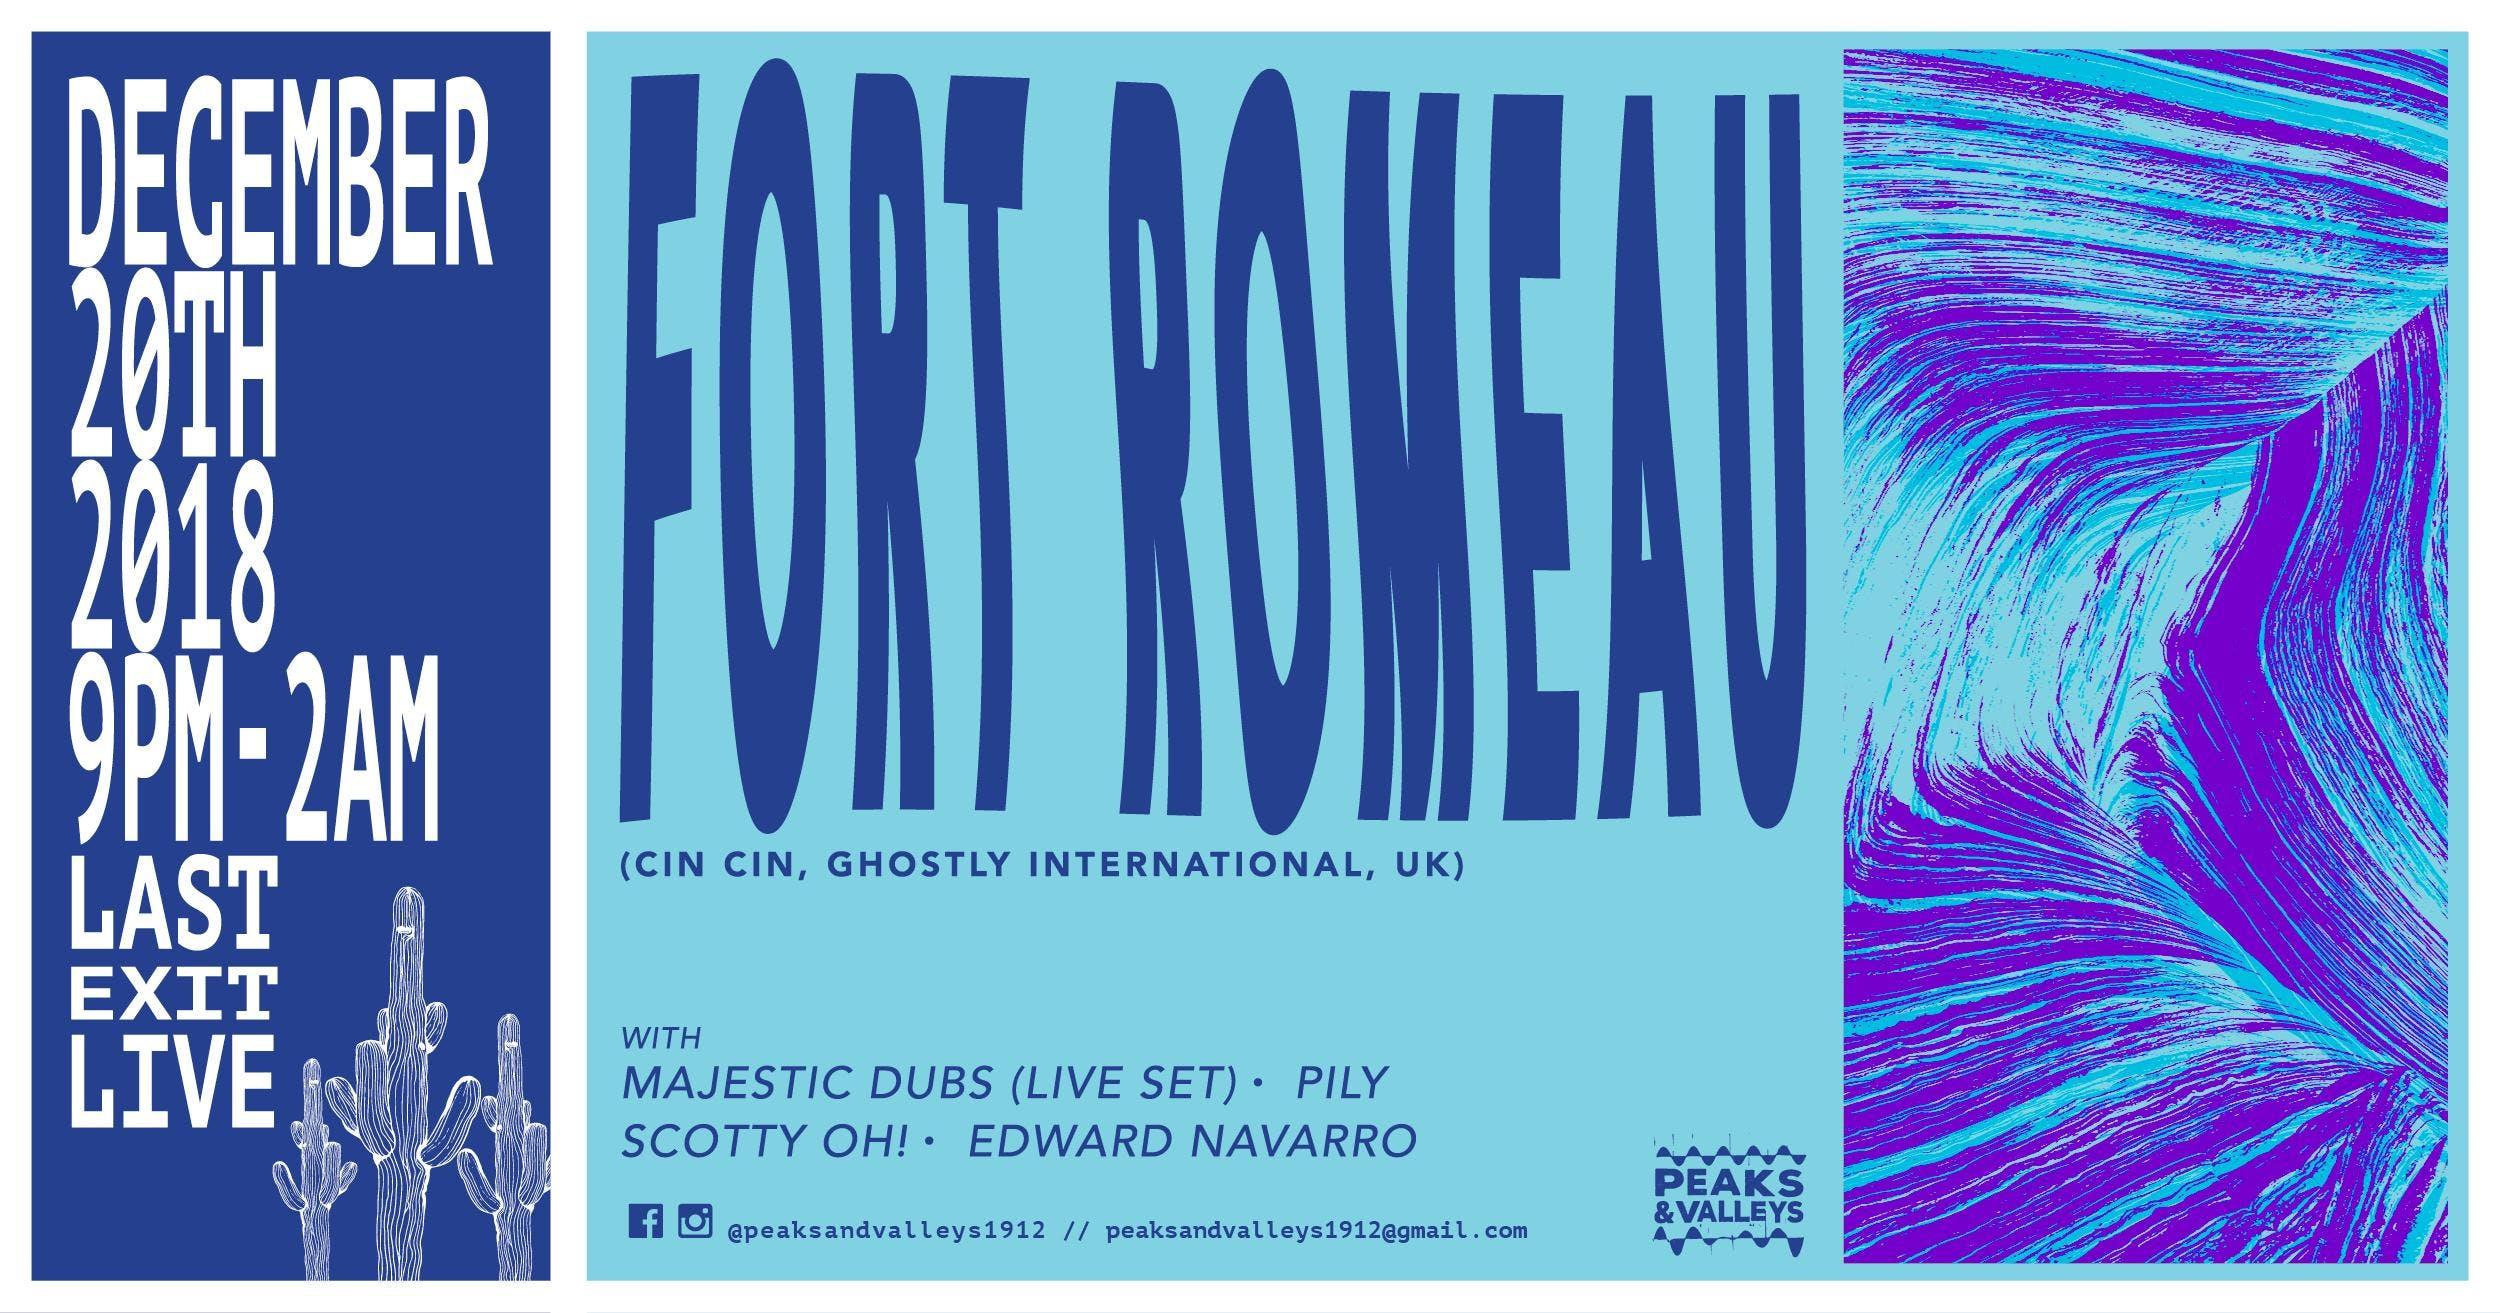 Fort Romeau at Peaks & Valleys